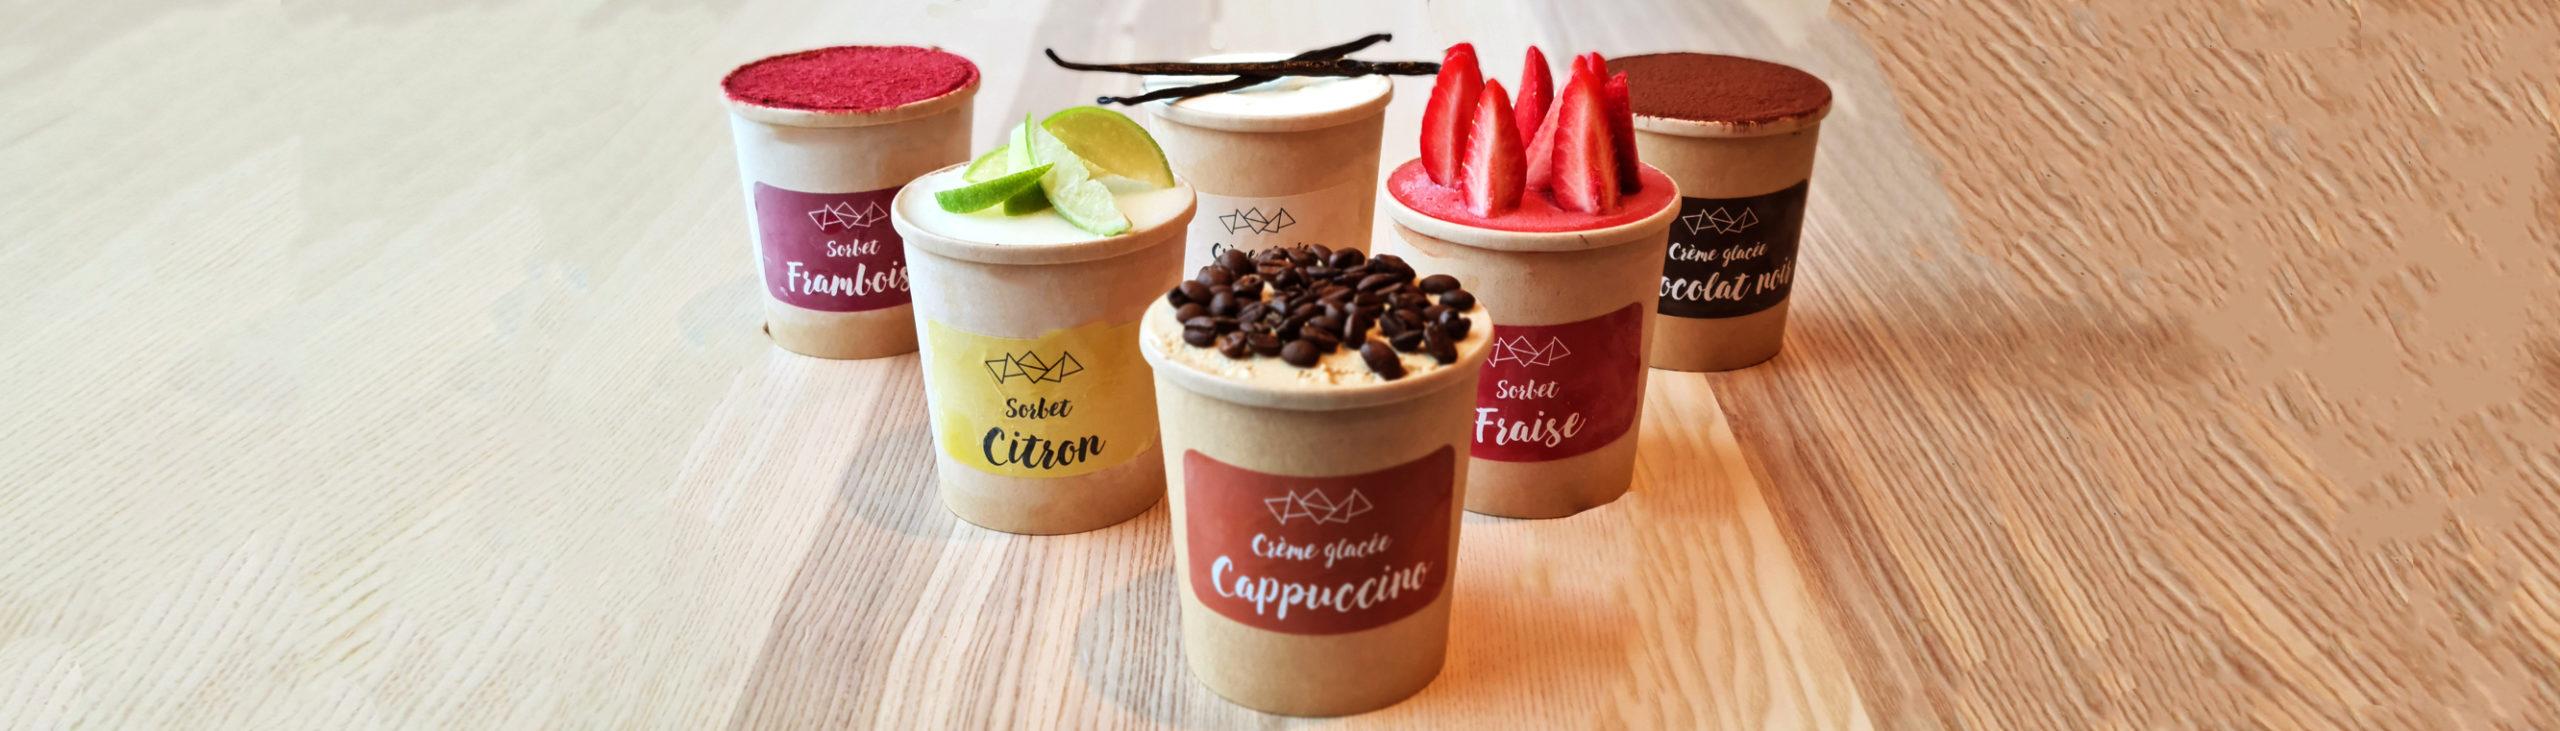 Crèmes glacées & Sorbets